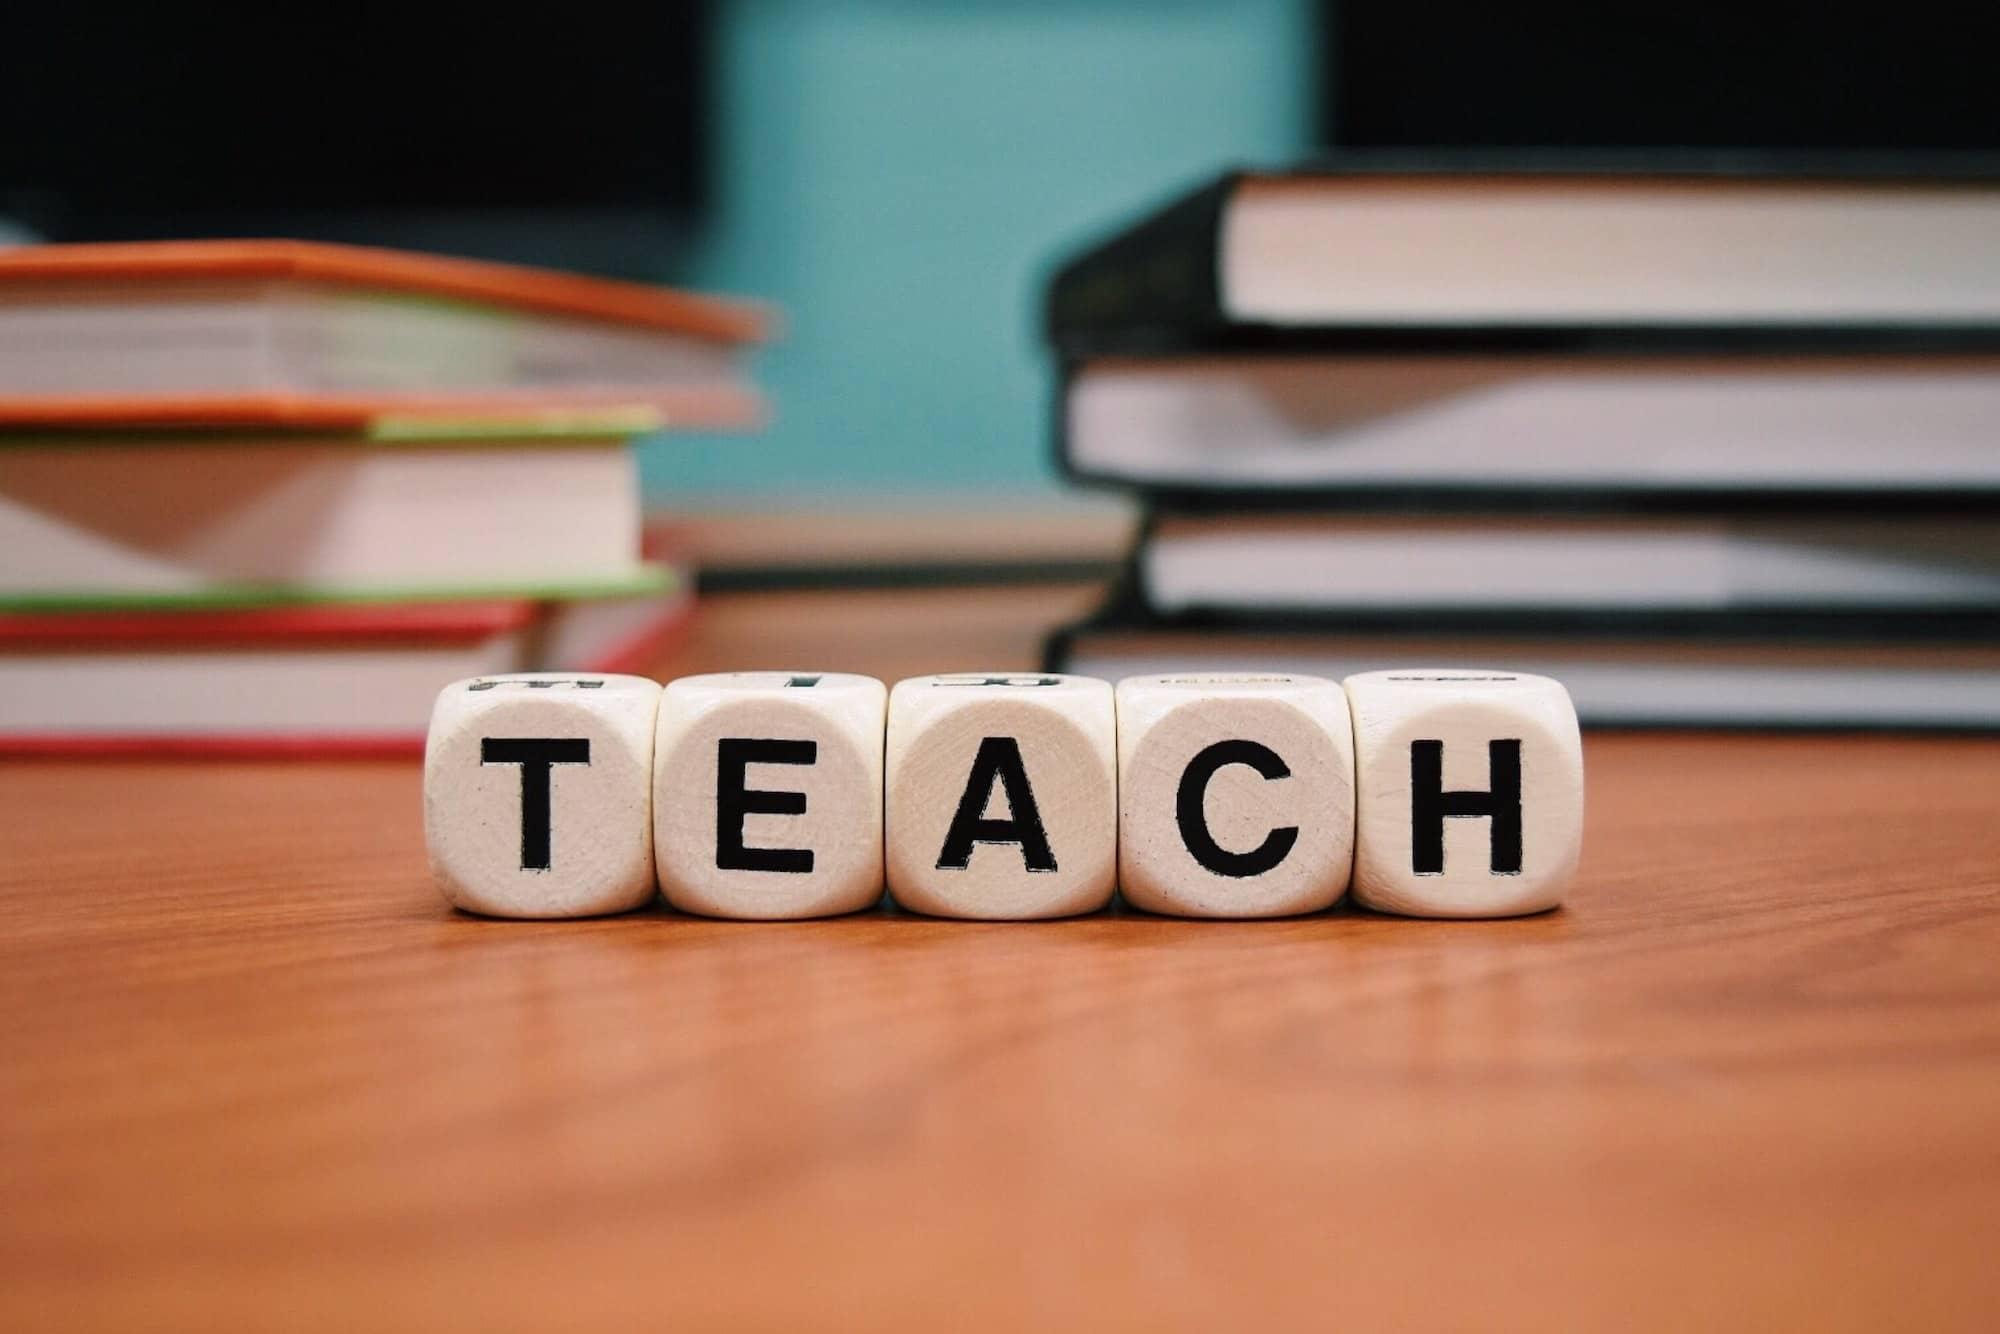 Teach en alphabet